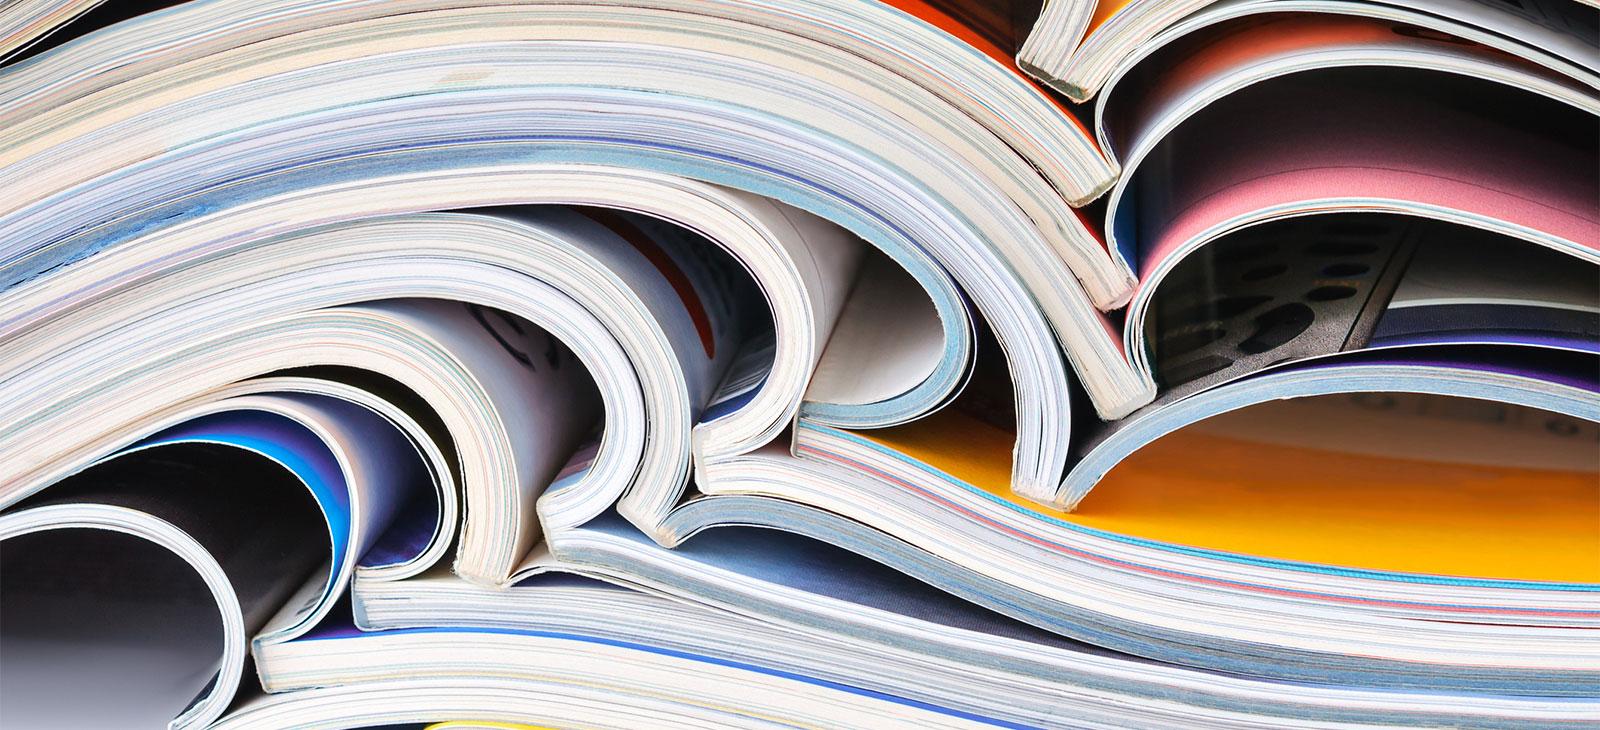 We have a broad range of binding capabilities